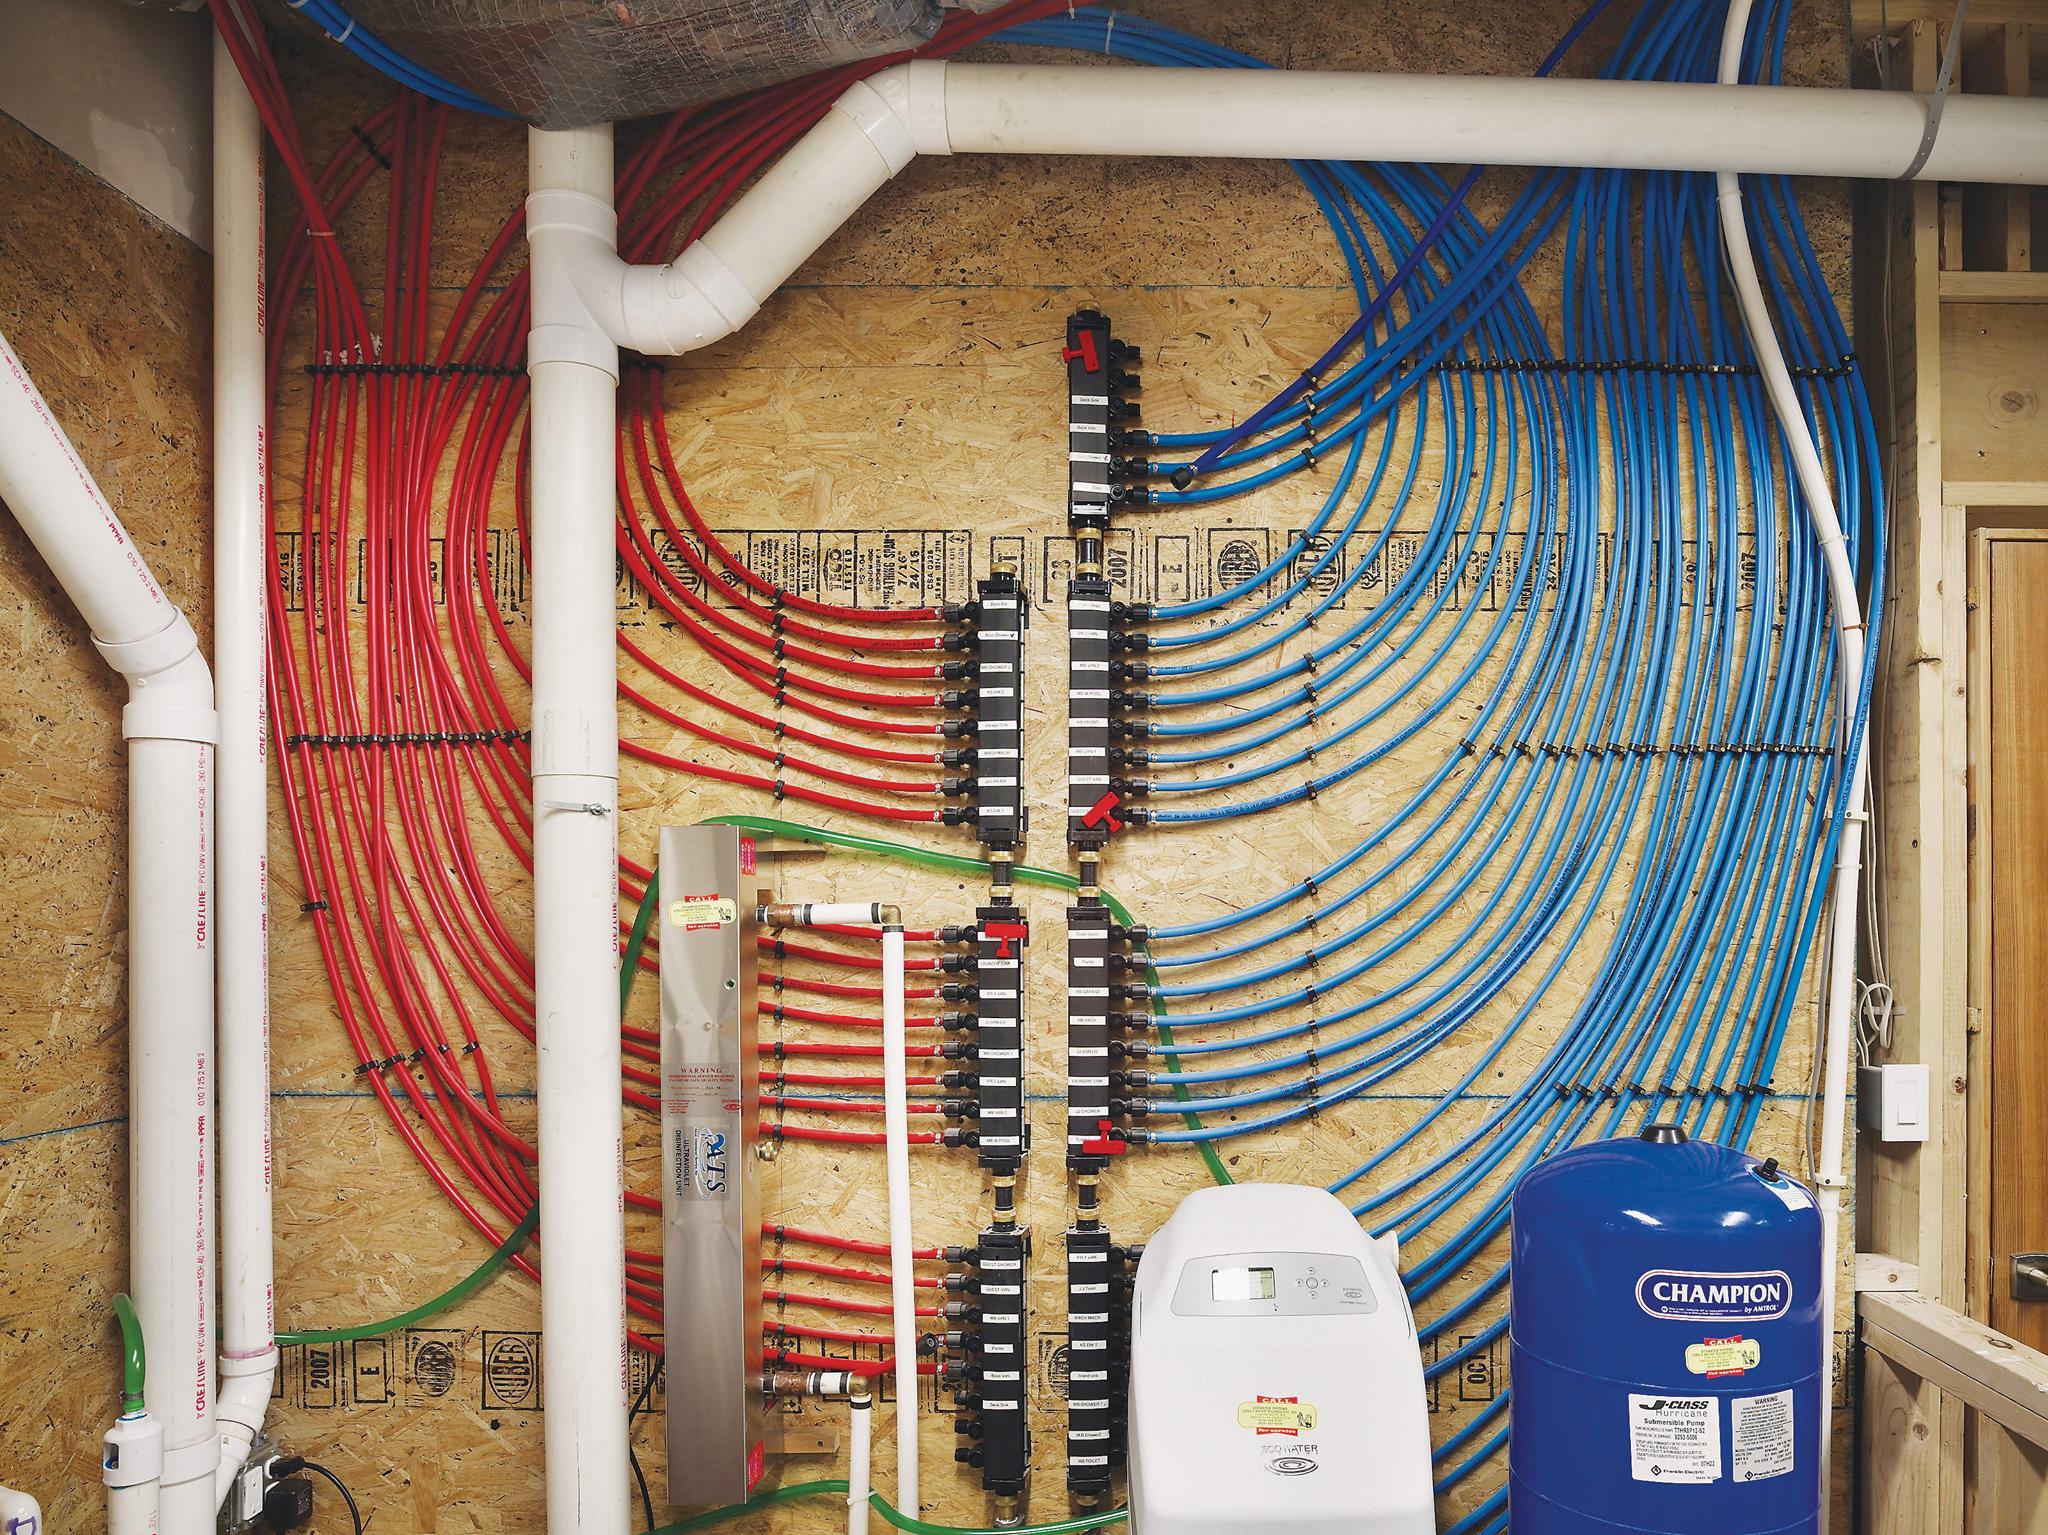 pex plumbing diagram bathroom fender telecaster wiring seymour duncan saturday homeowner workshop series brick